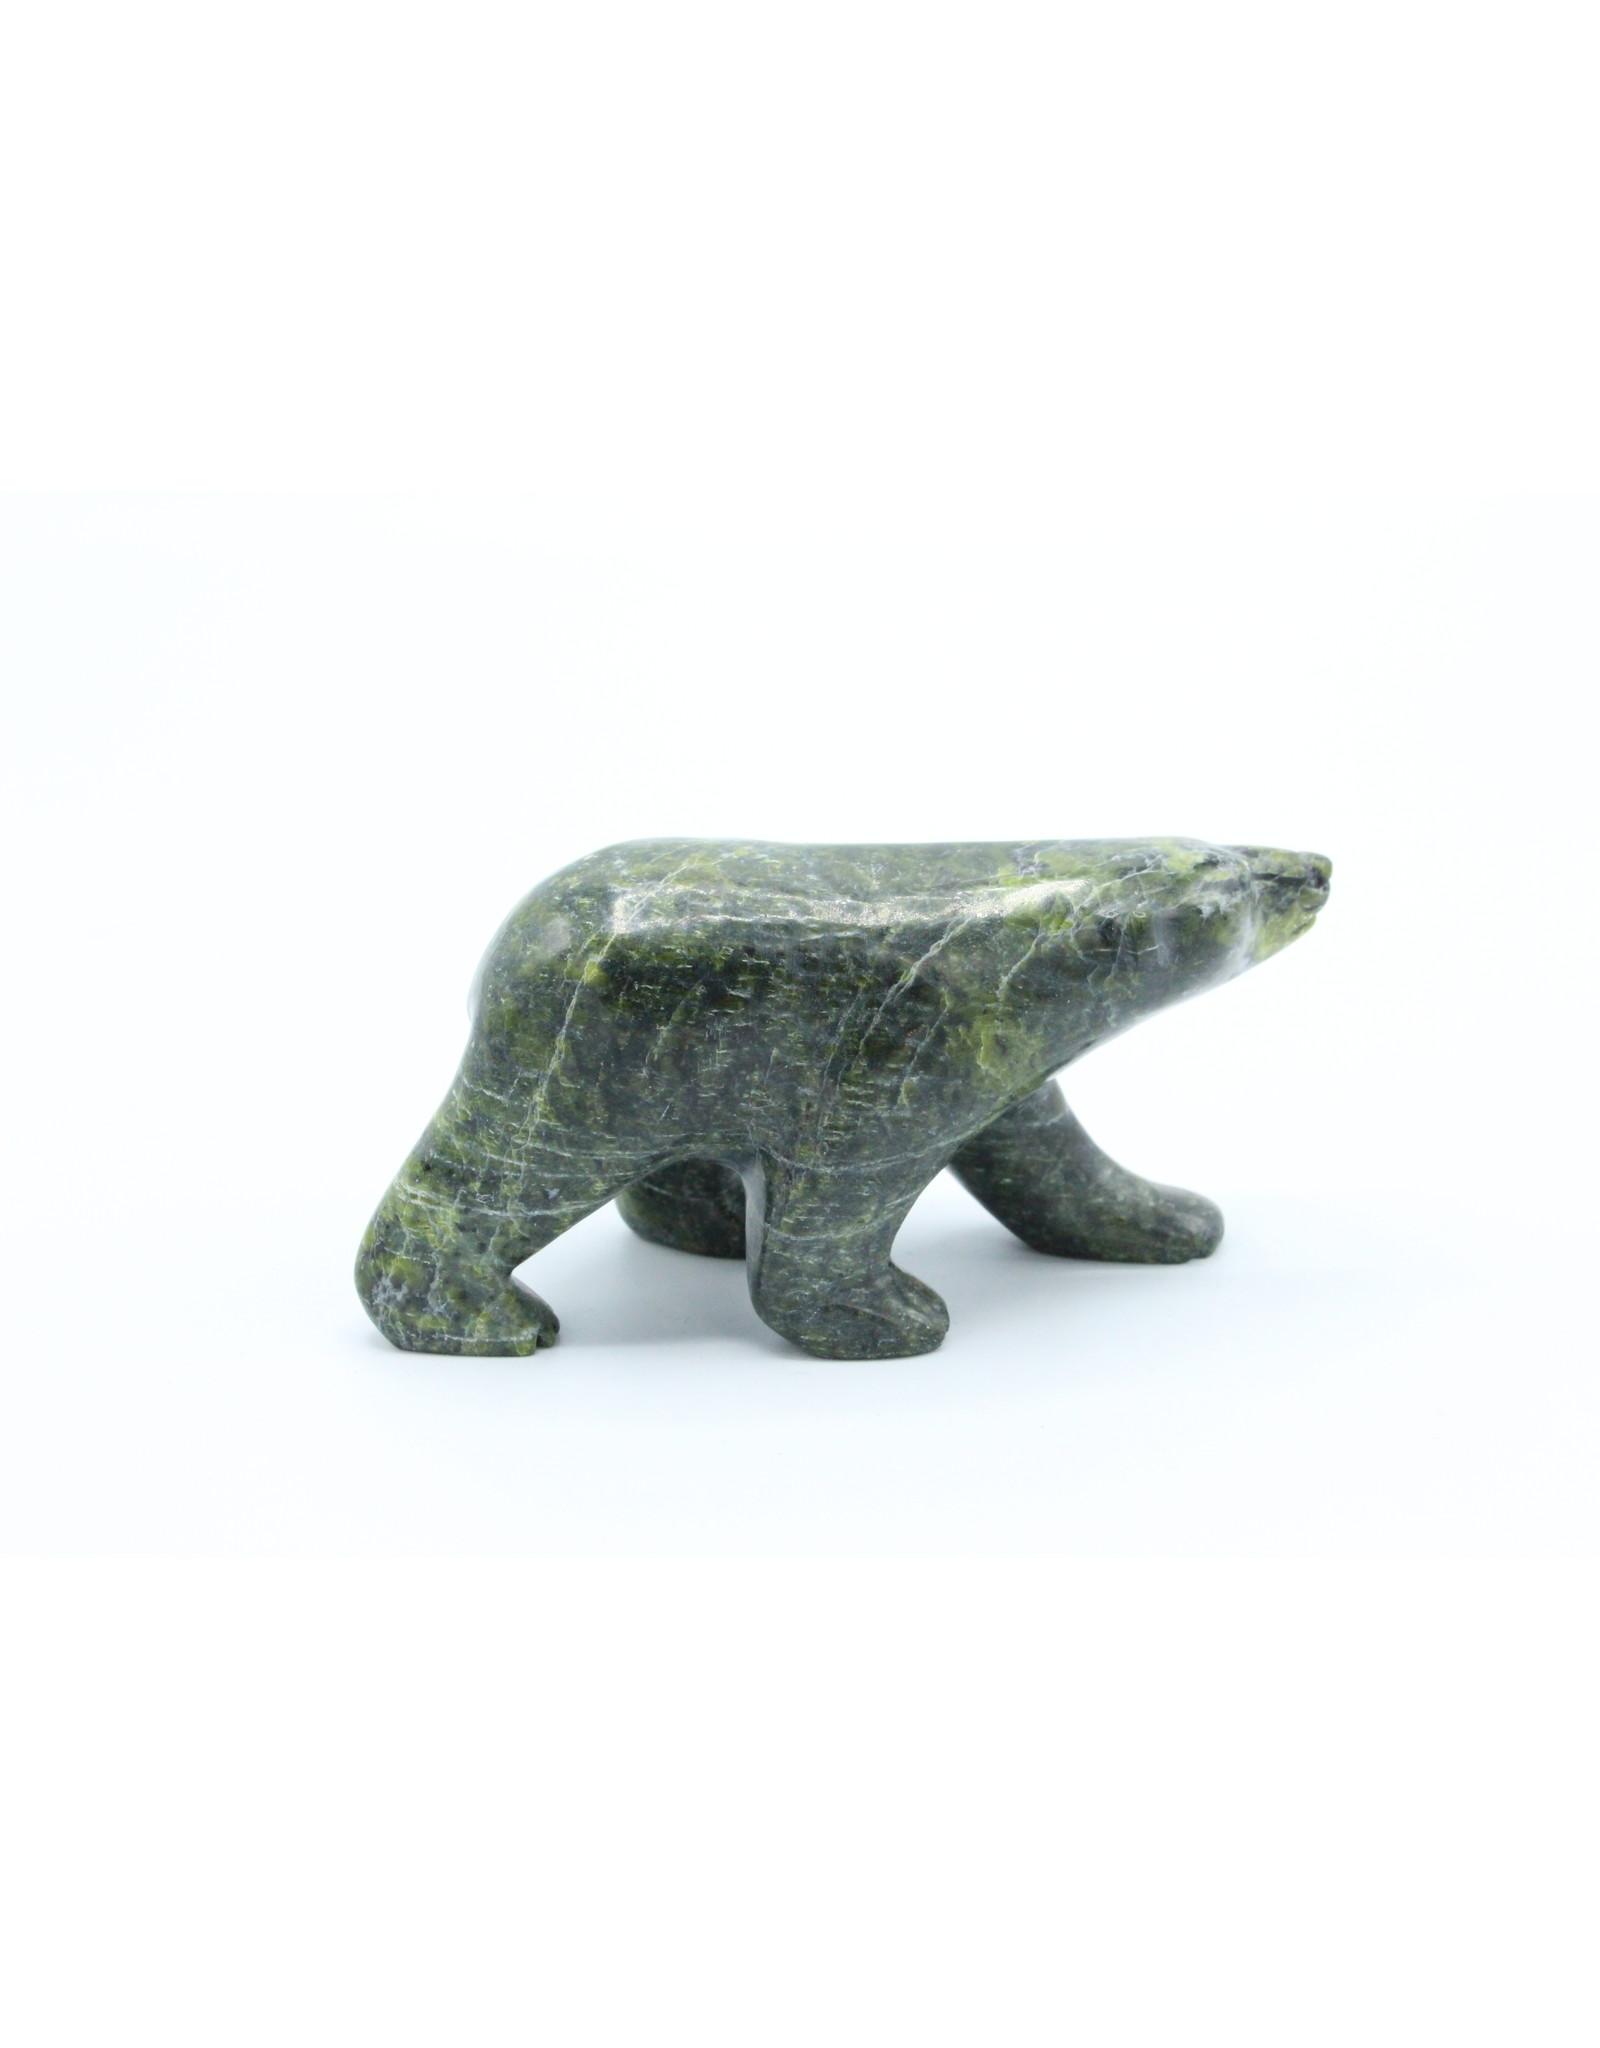 64594 Bear by Allan Shutiapik